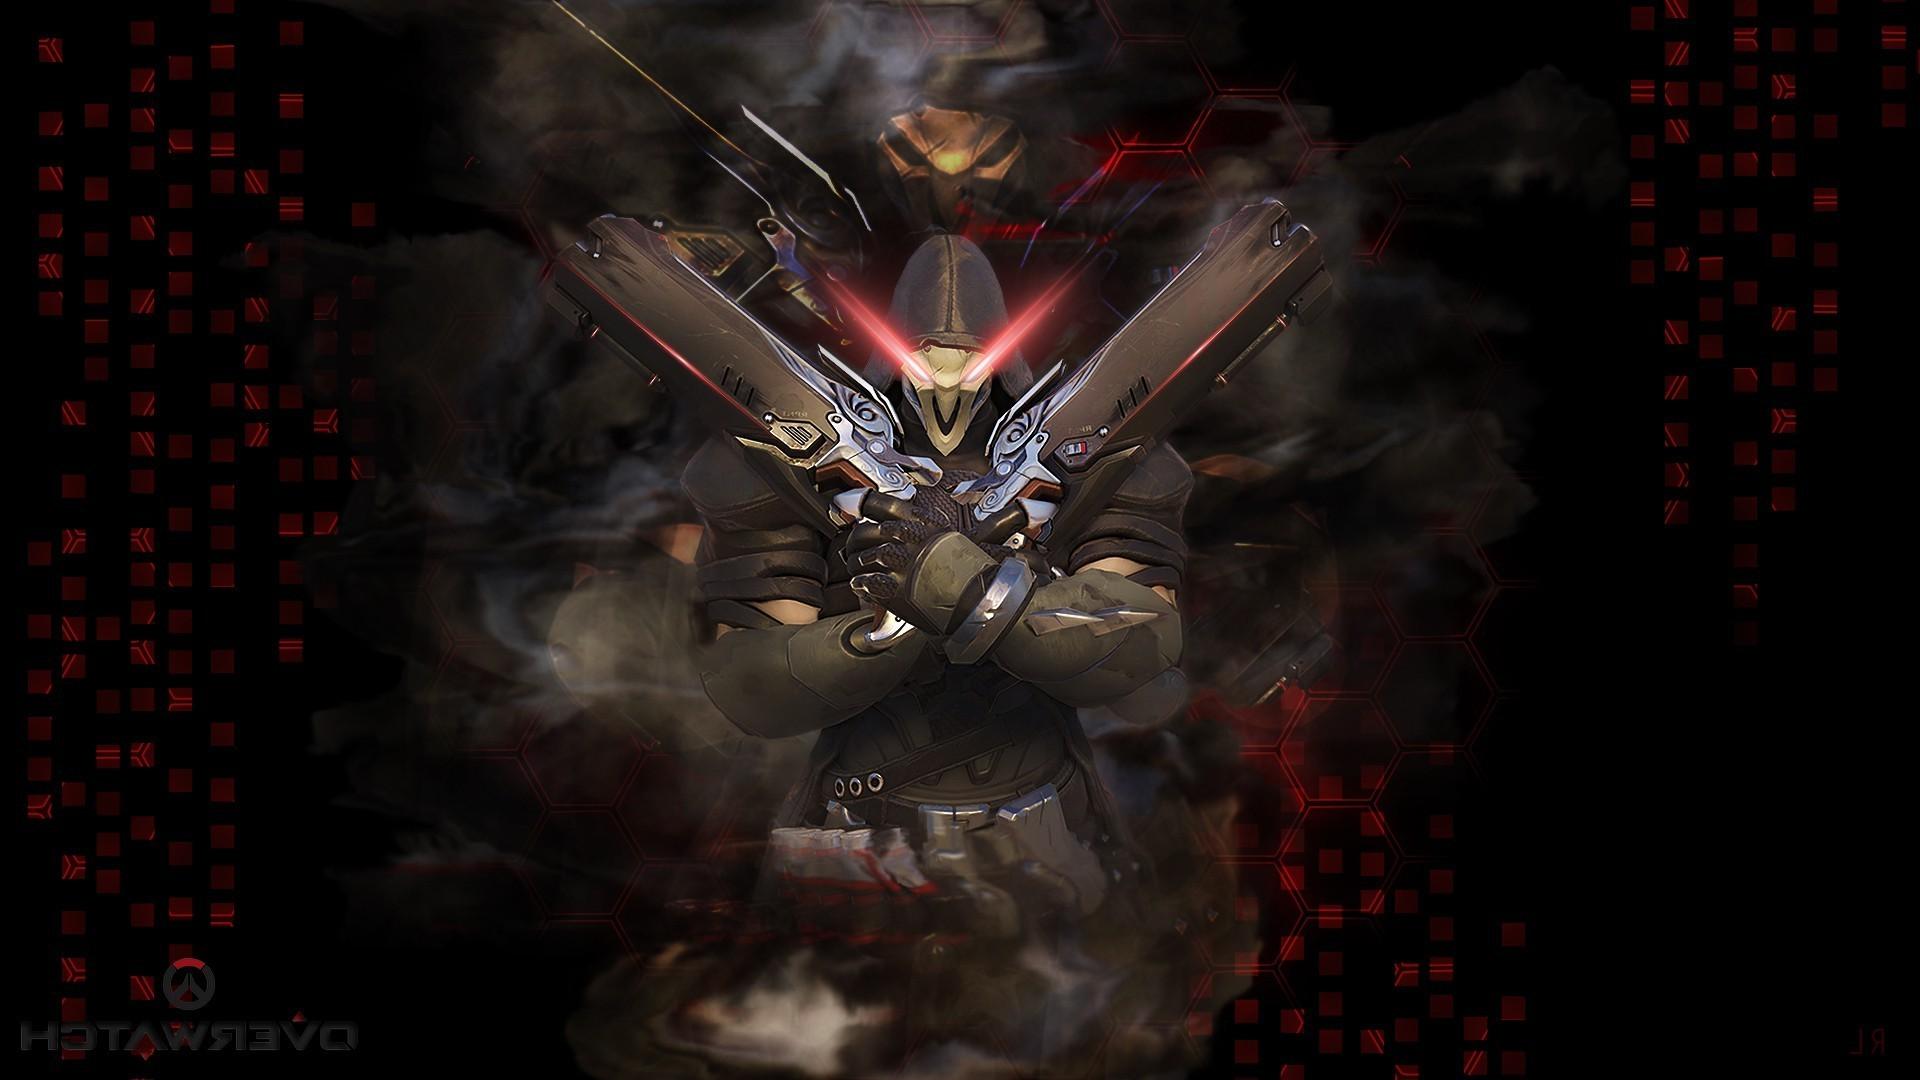 Wallpaper 1920x1080 Px Blizzard Entertainment Reaper